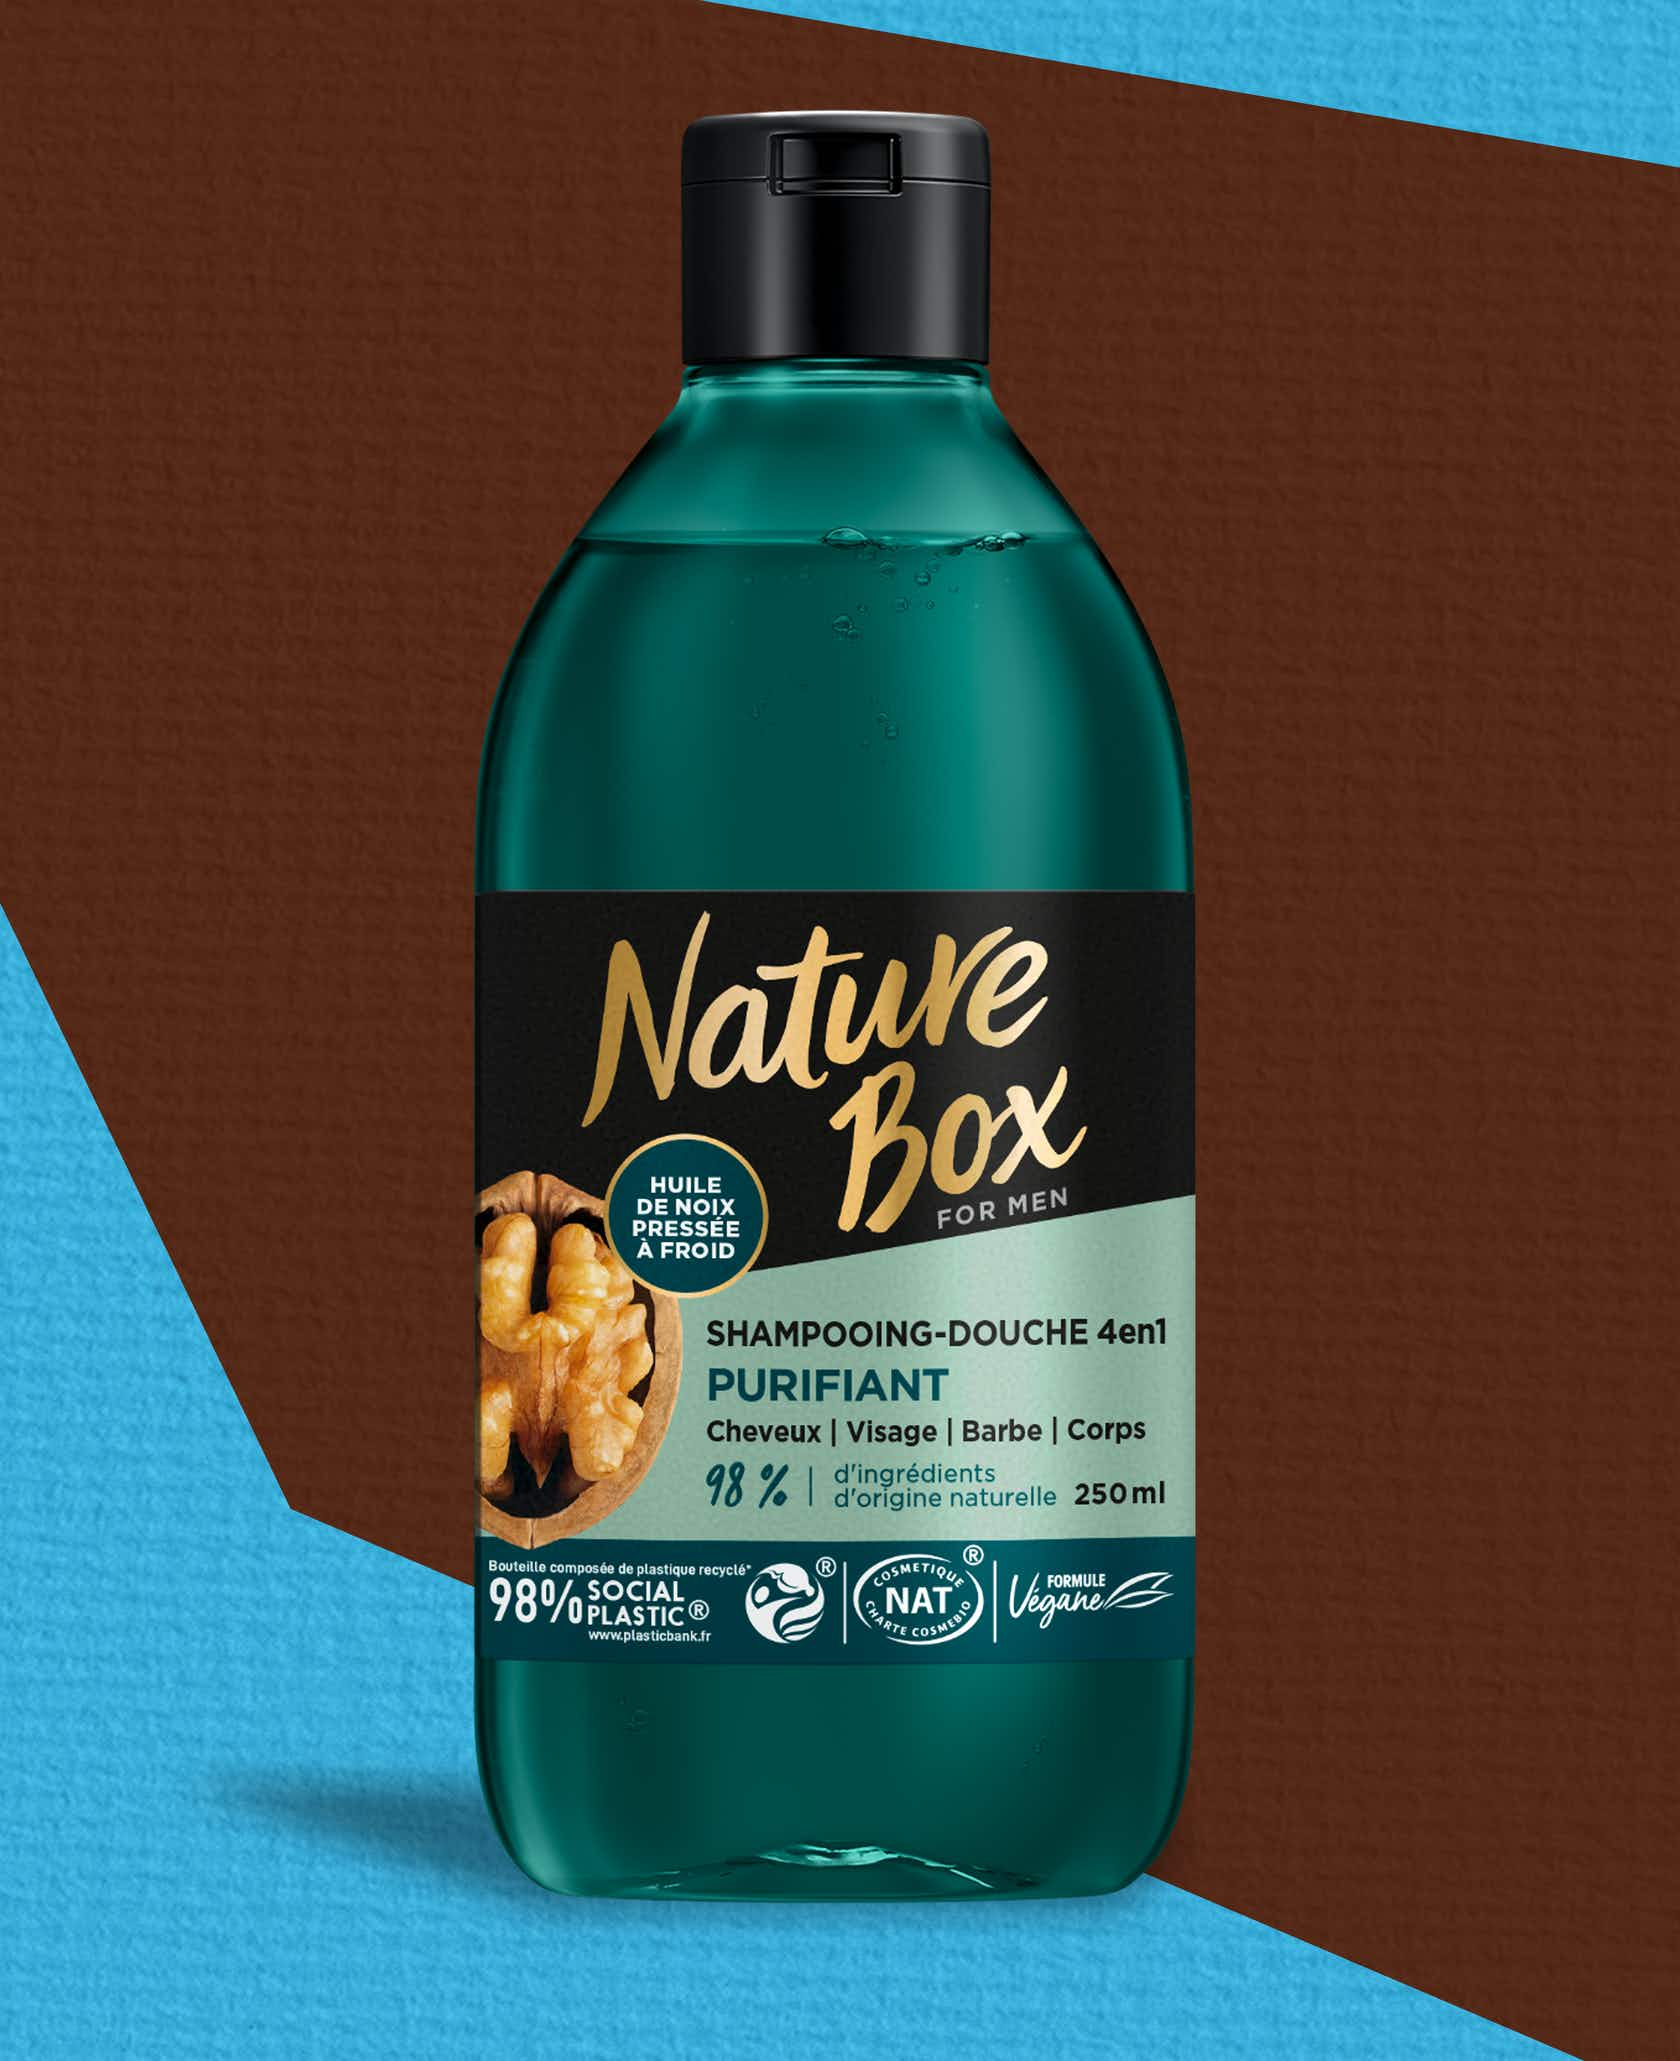 Shampooing-Douche 4 en 1 Purifiant